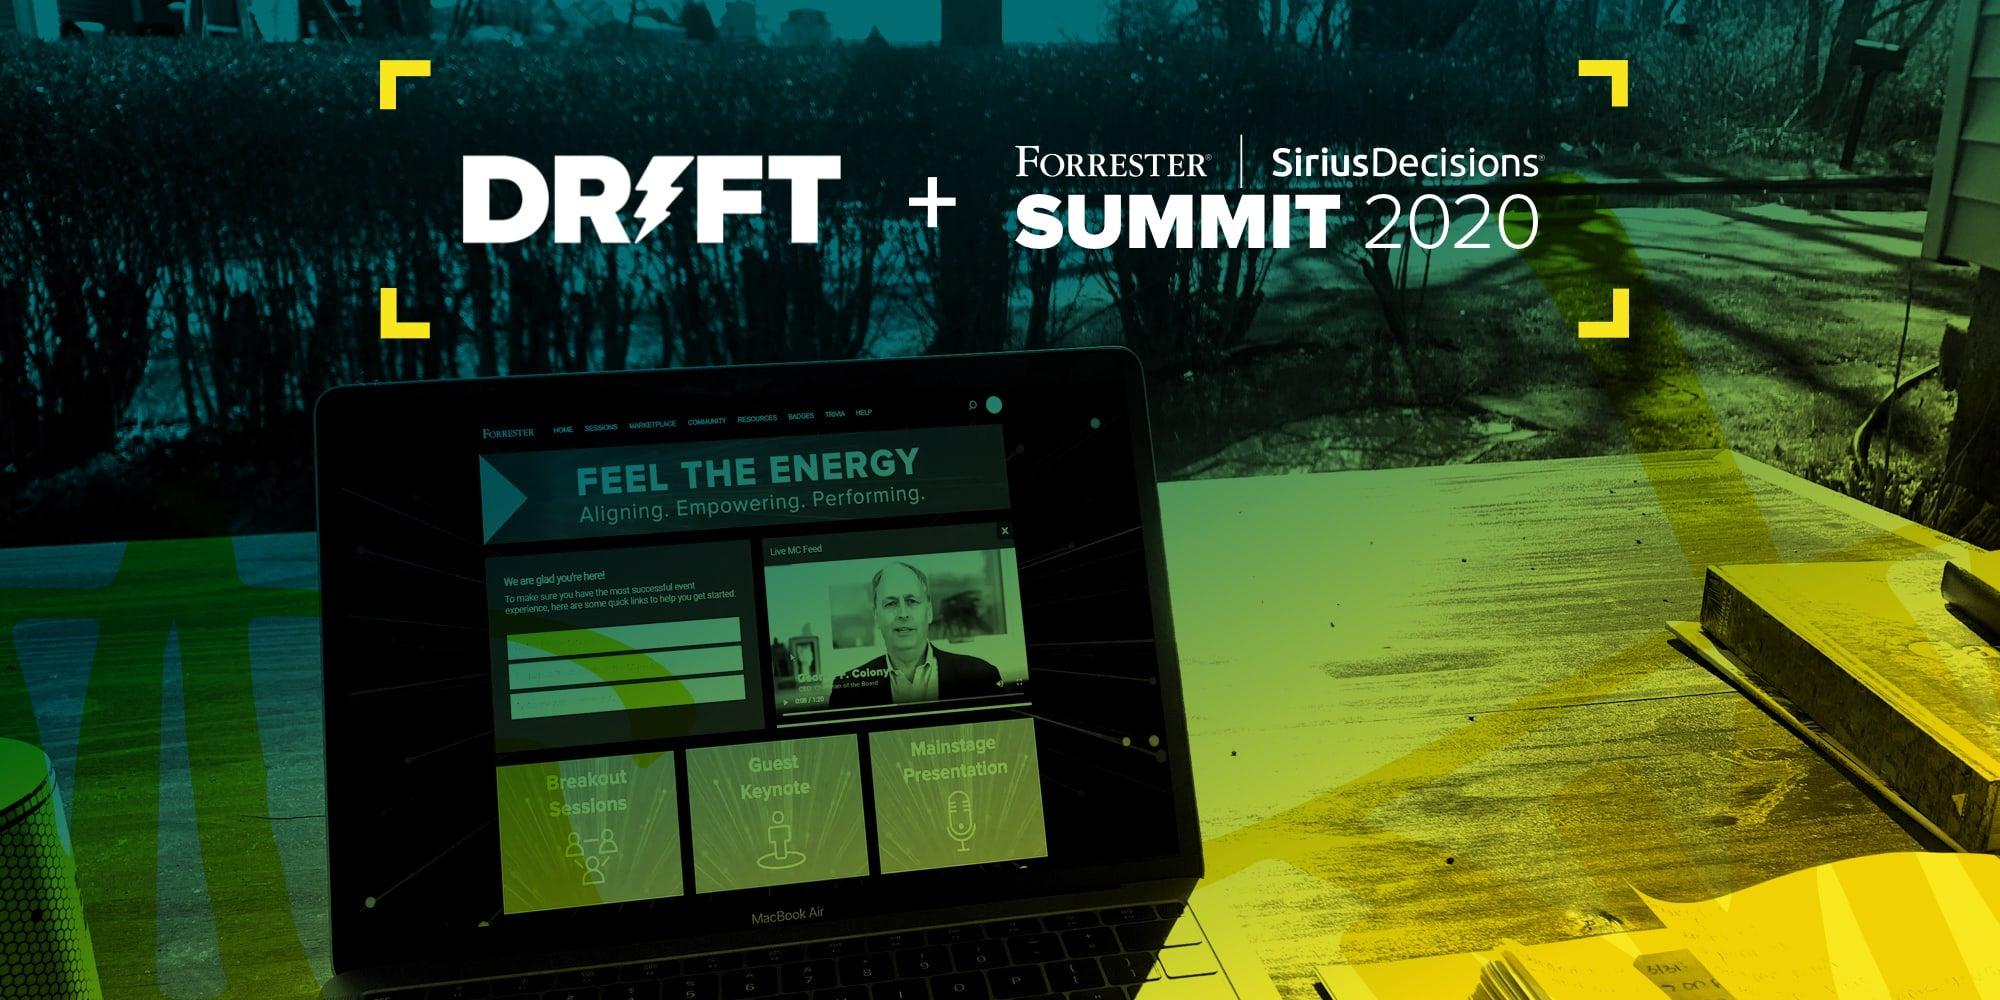 SiriusDecisions Summit 2020